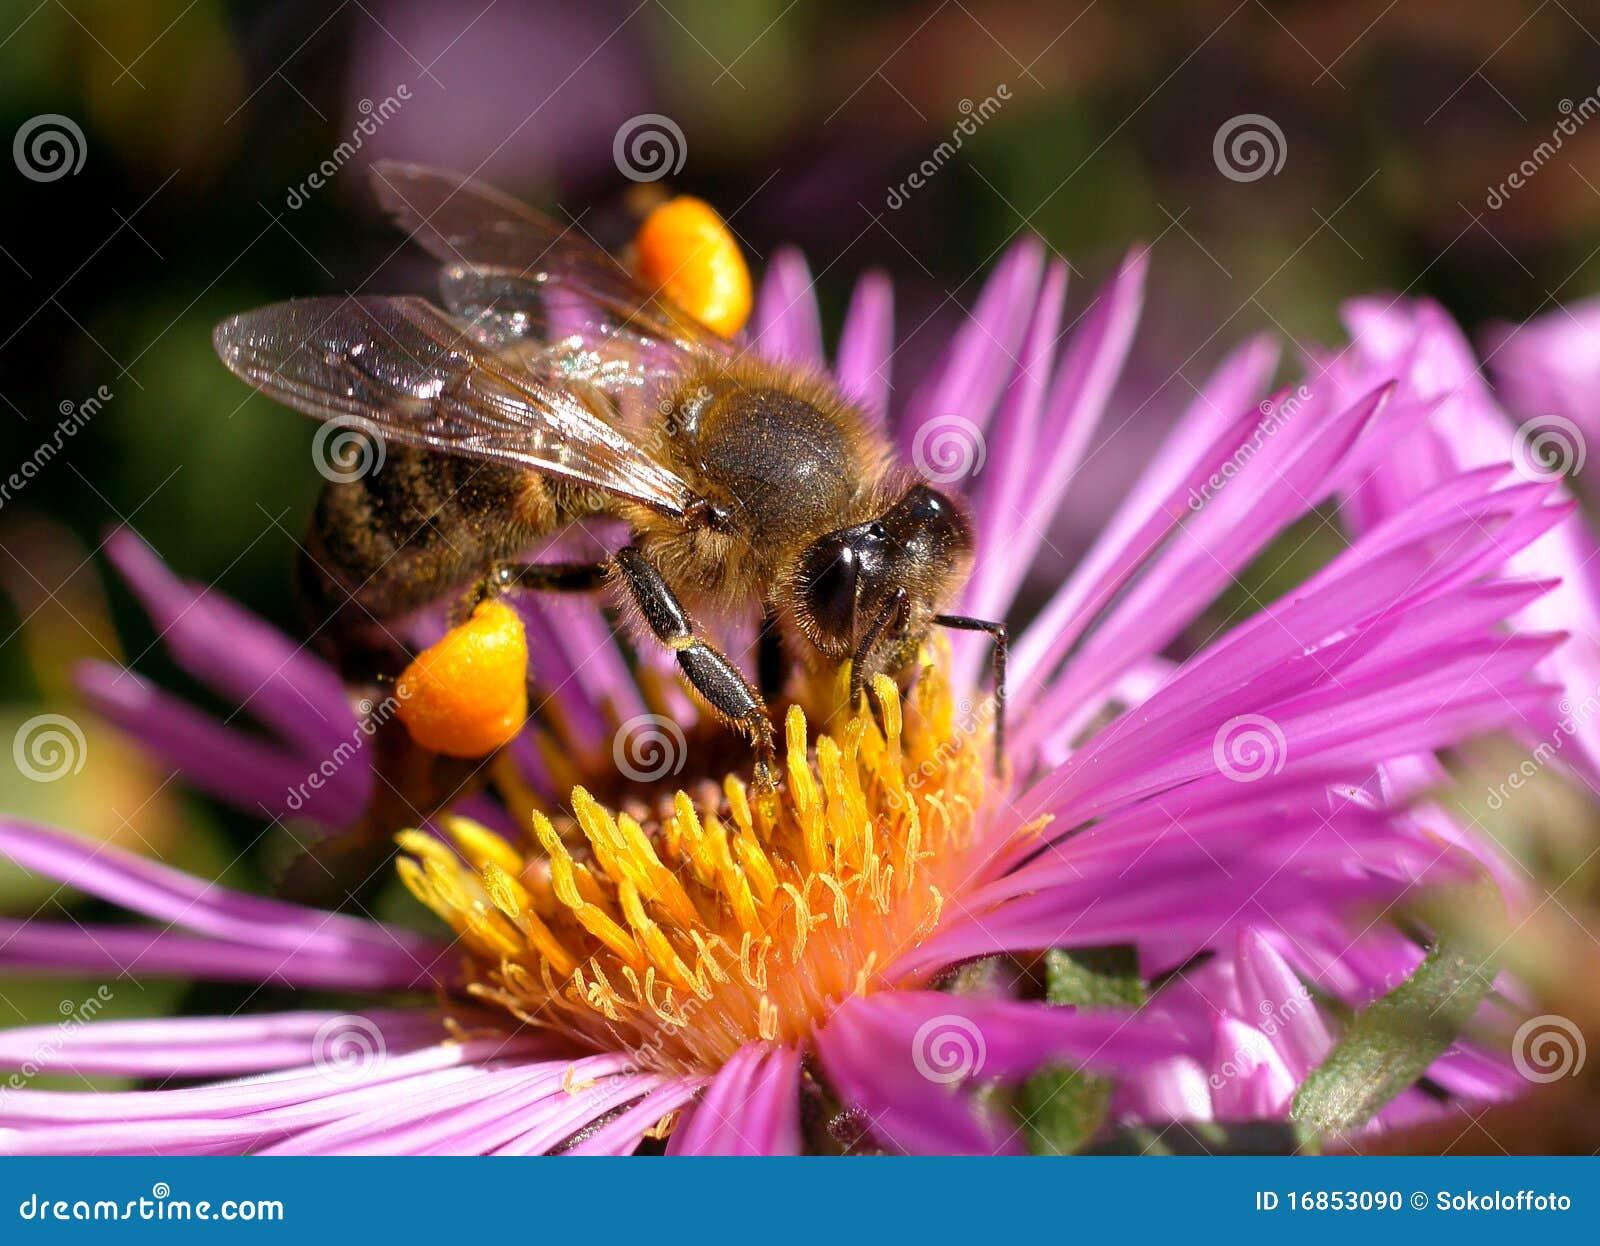 O mundo dos insetos